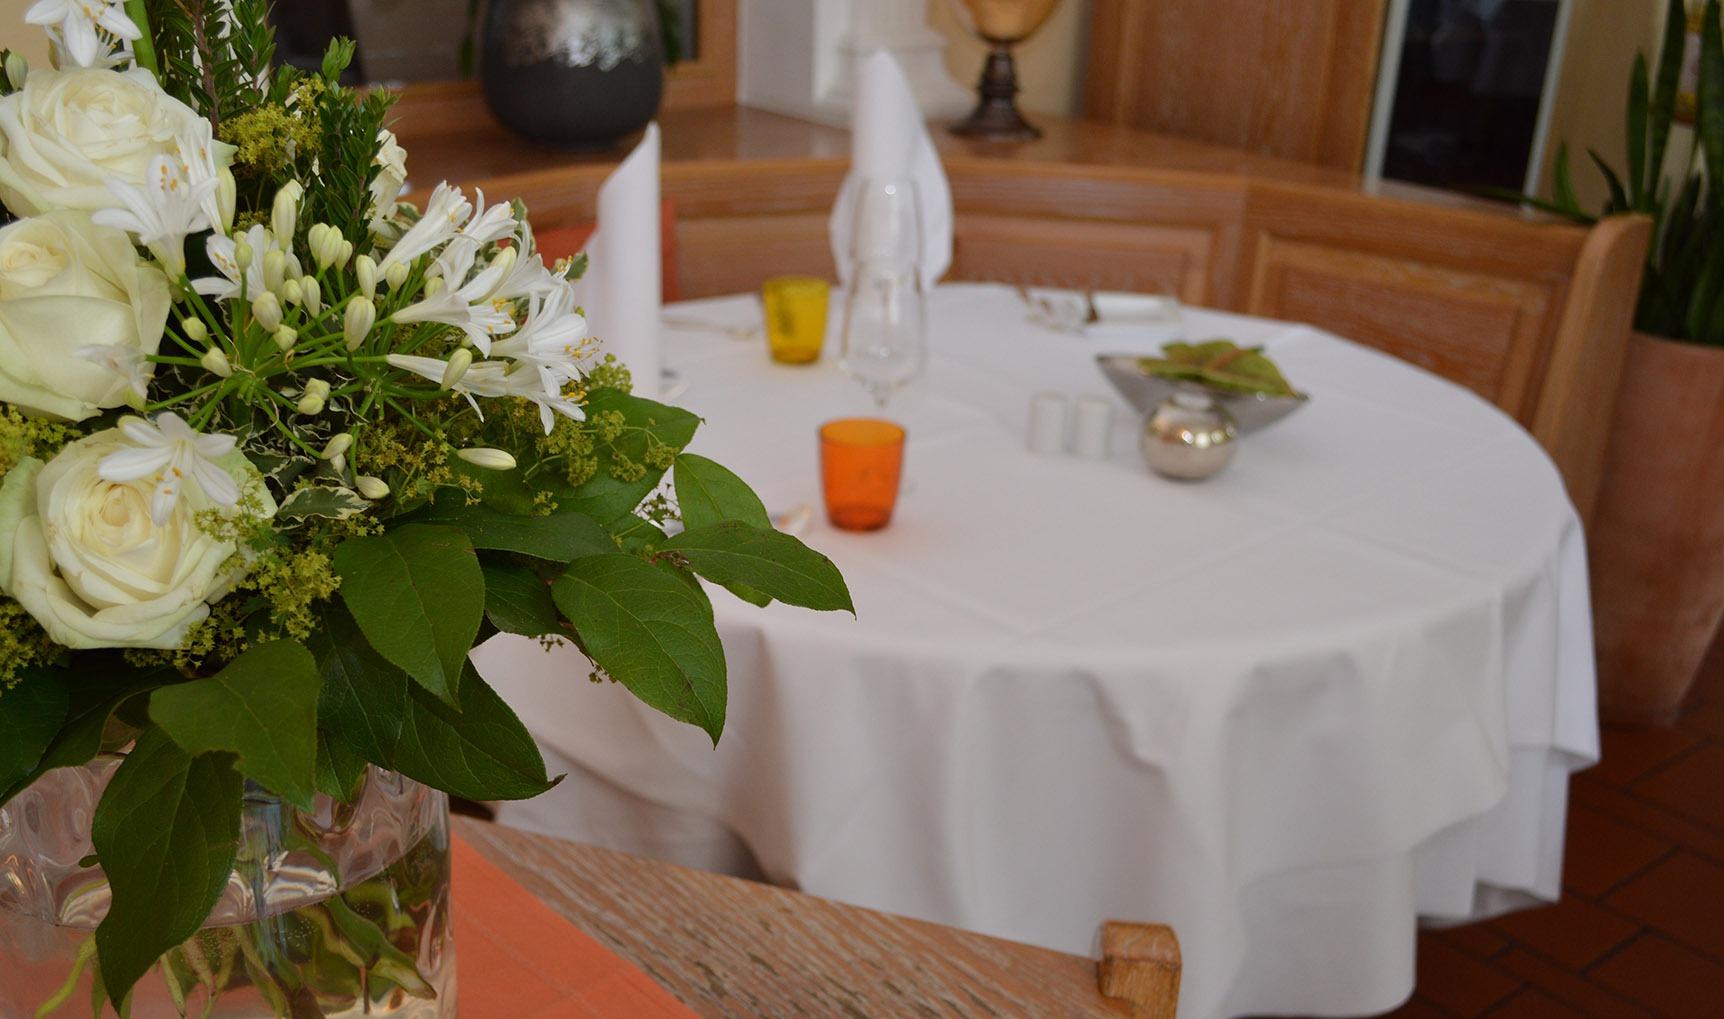 stephans-stuben-restaurant-neu-ulm-5